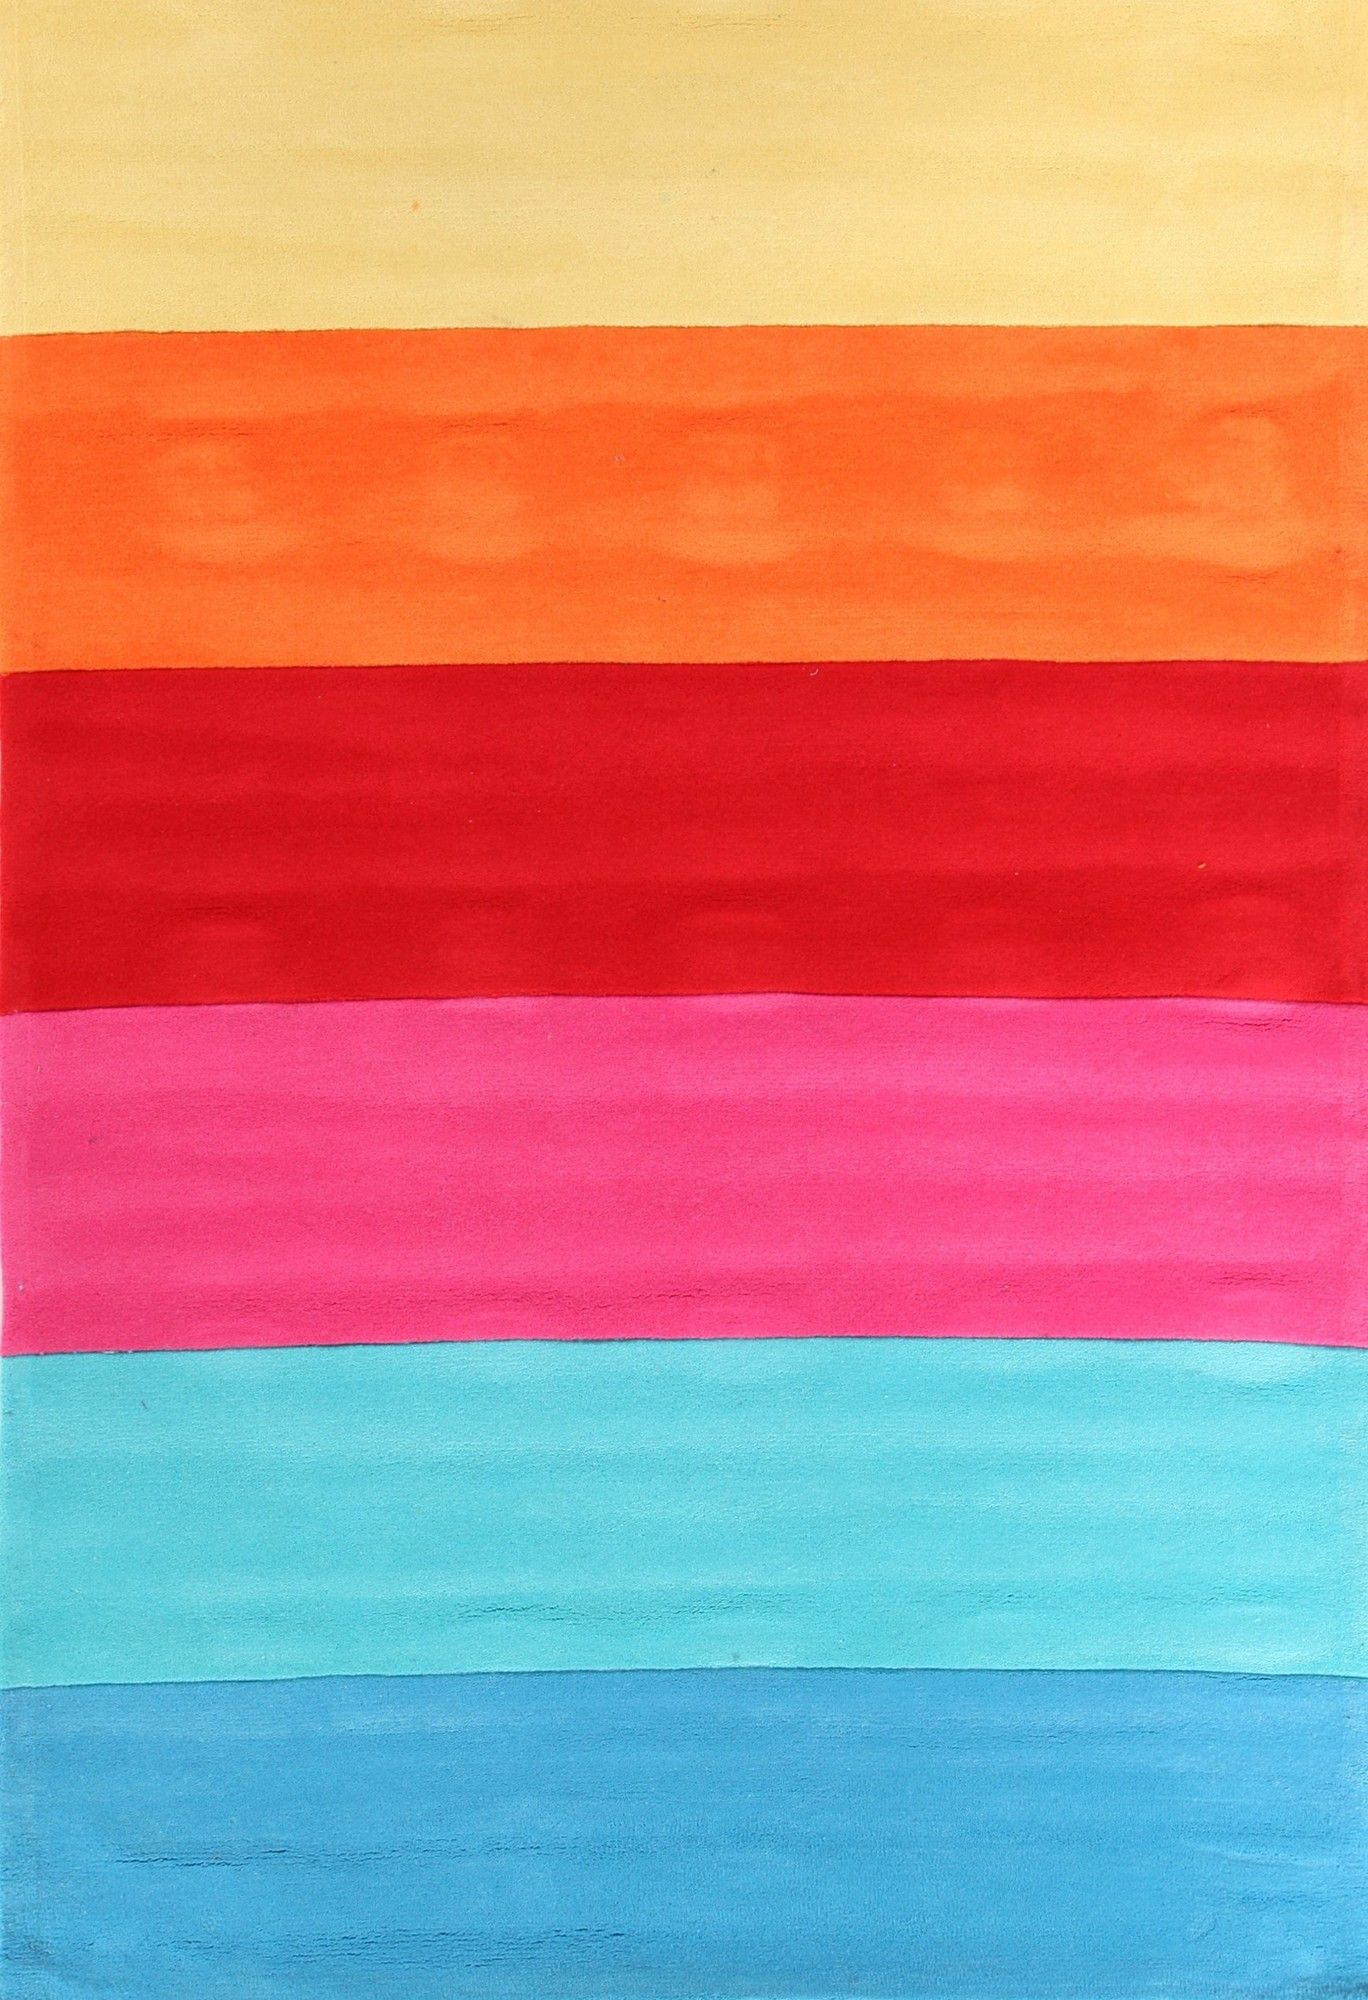 Rainbow Pink Stripe Rug By Network Rugs